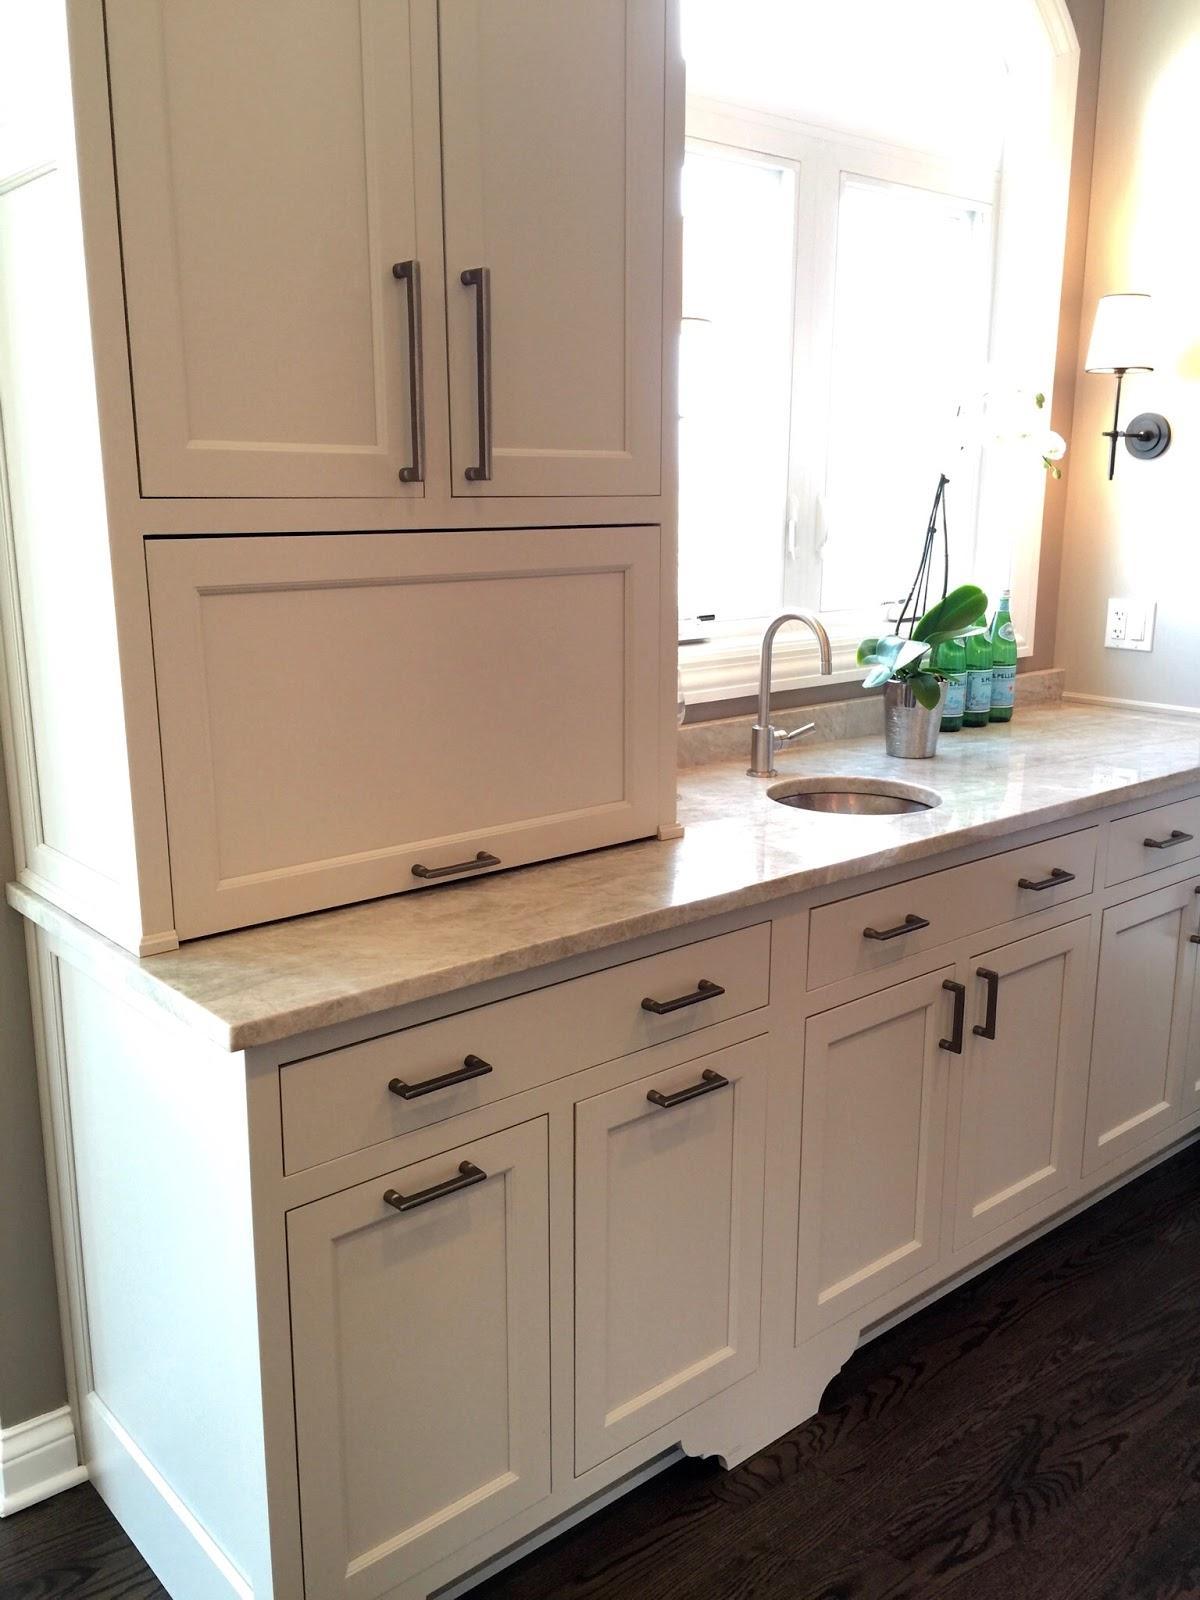 Chicago 39 S Northshore Designer Kitchen Tour Home With Keki